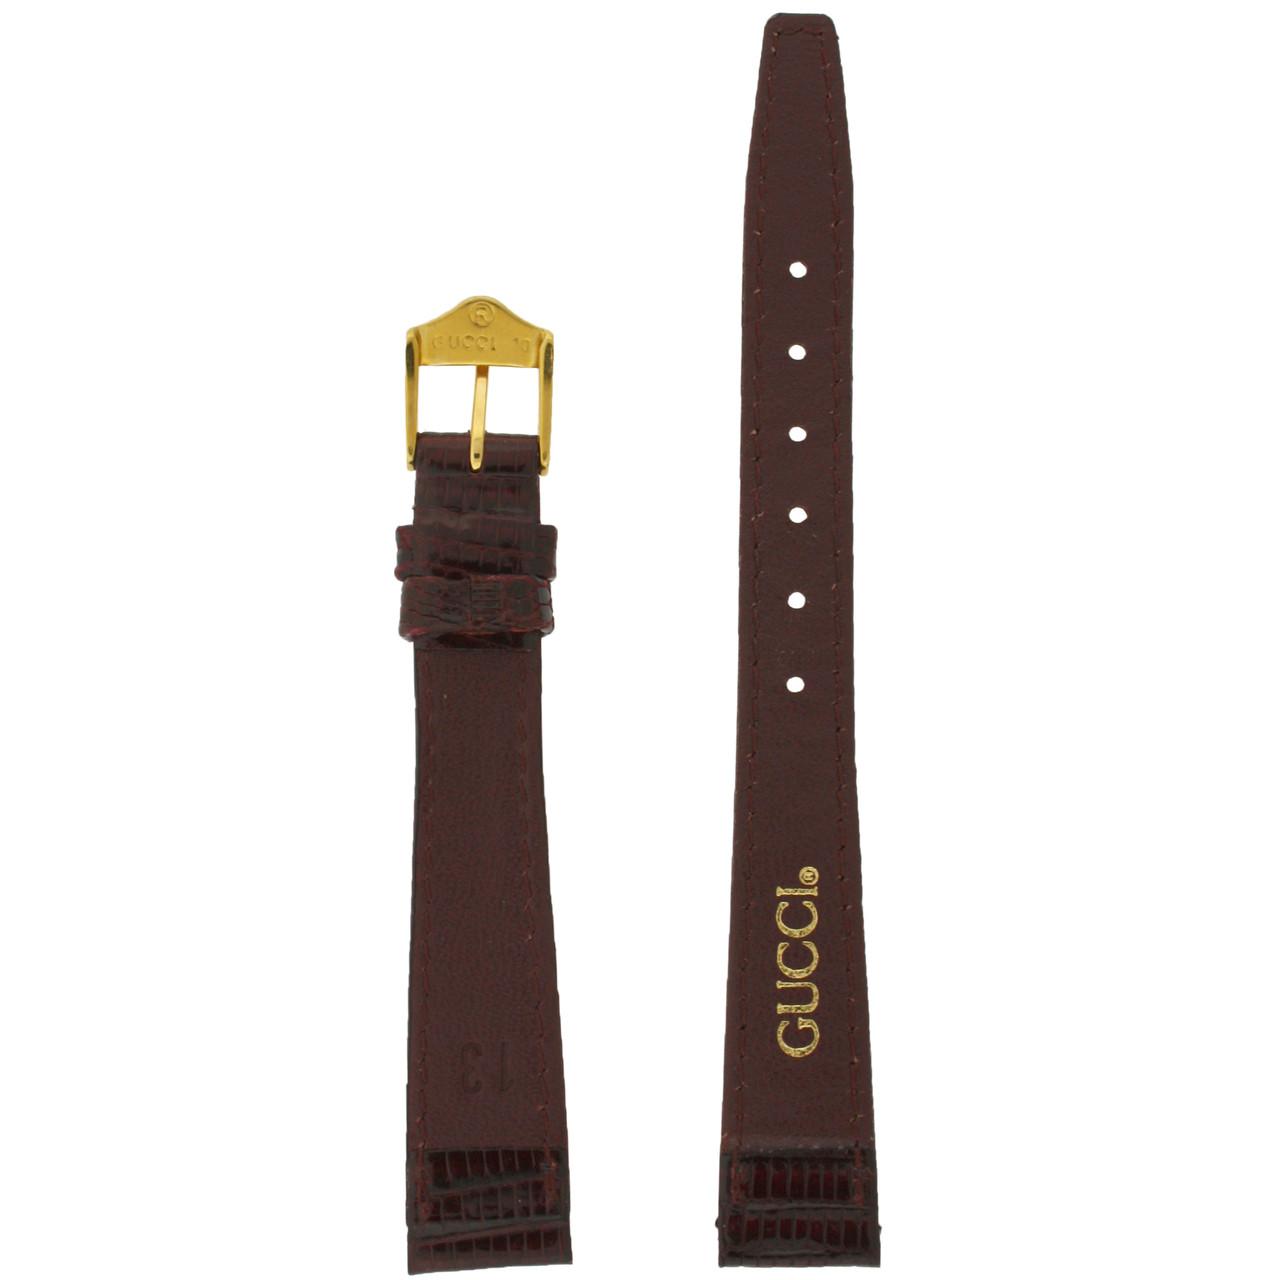 Gucci 3000L Lizard watchband